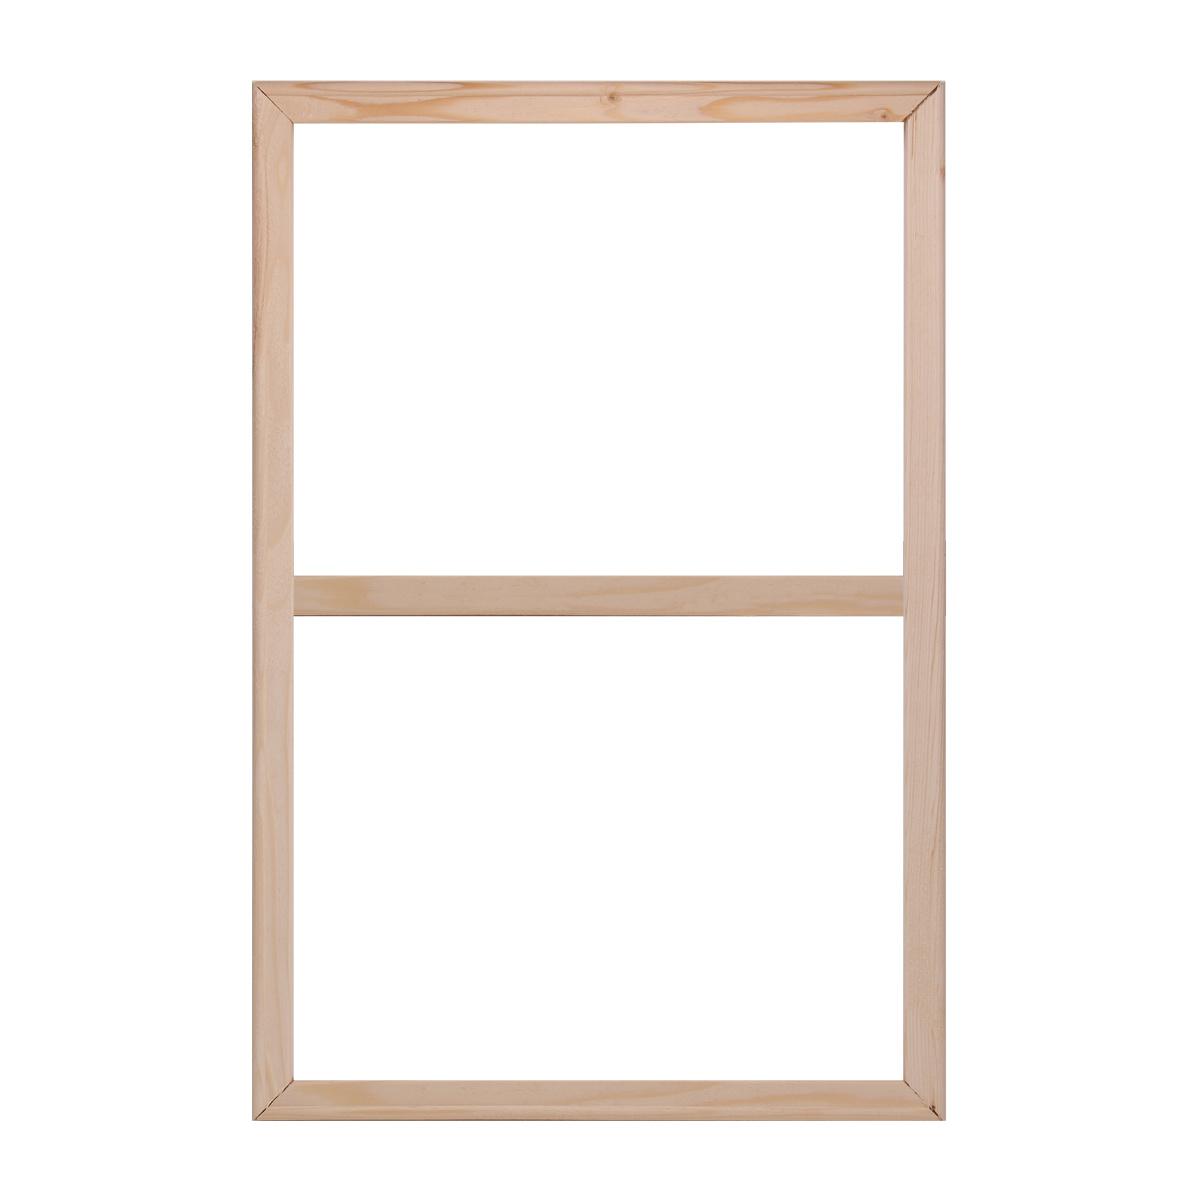 leinwand bilder holz rahmen f r leinwand keilrahmen bilder 10 gr en ebay. Black Bedroom Furniture Sets. Home Design Ideas